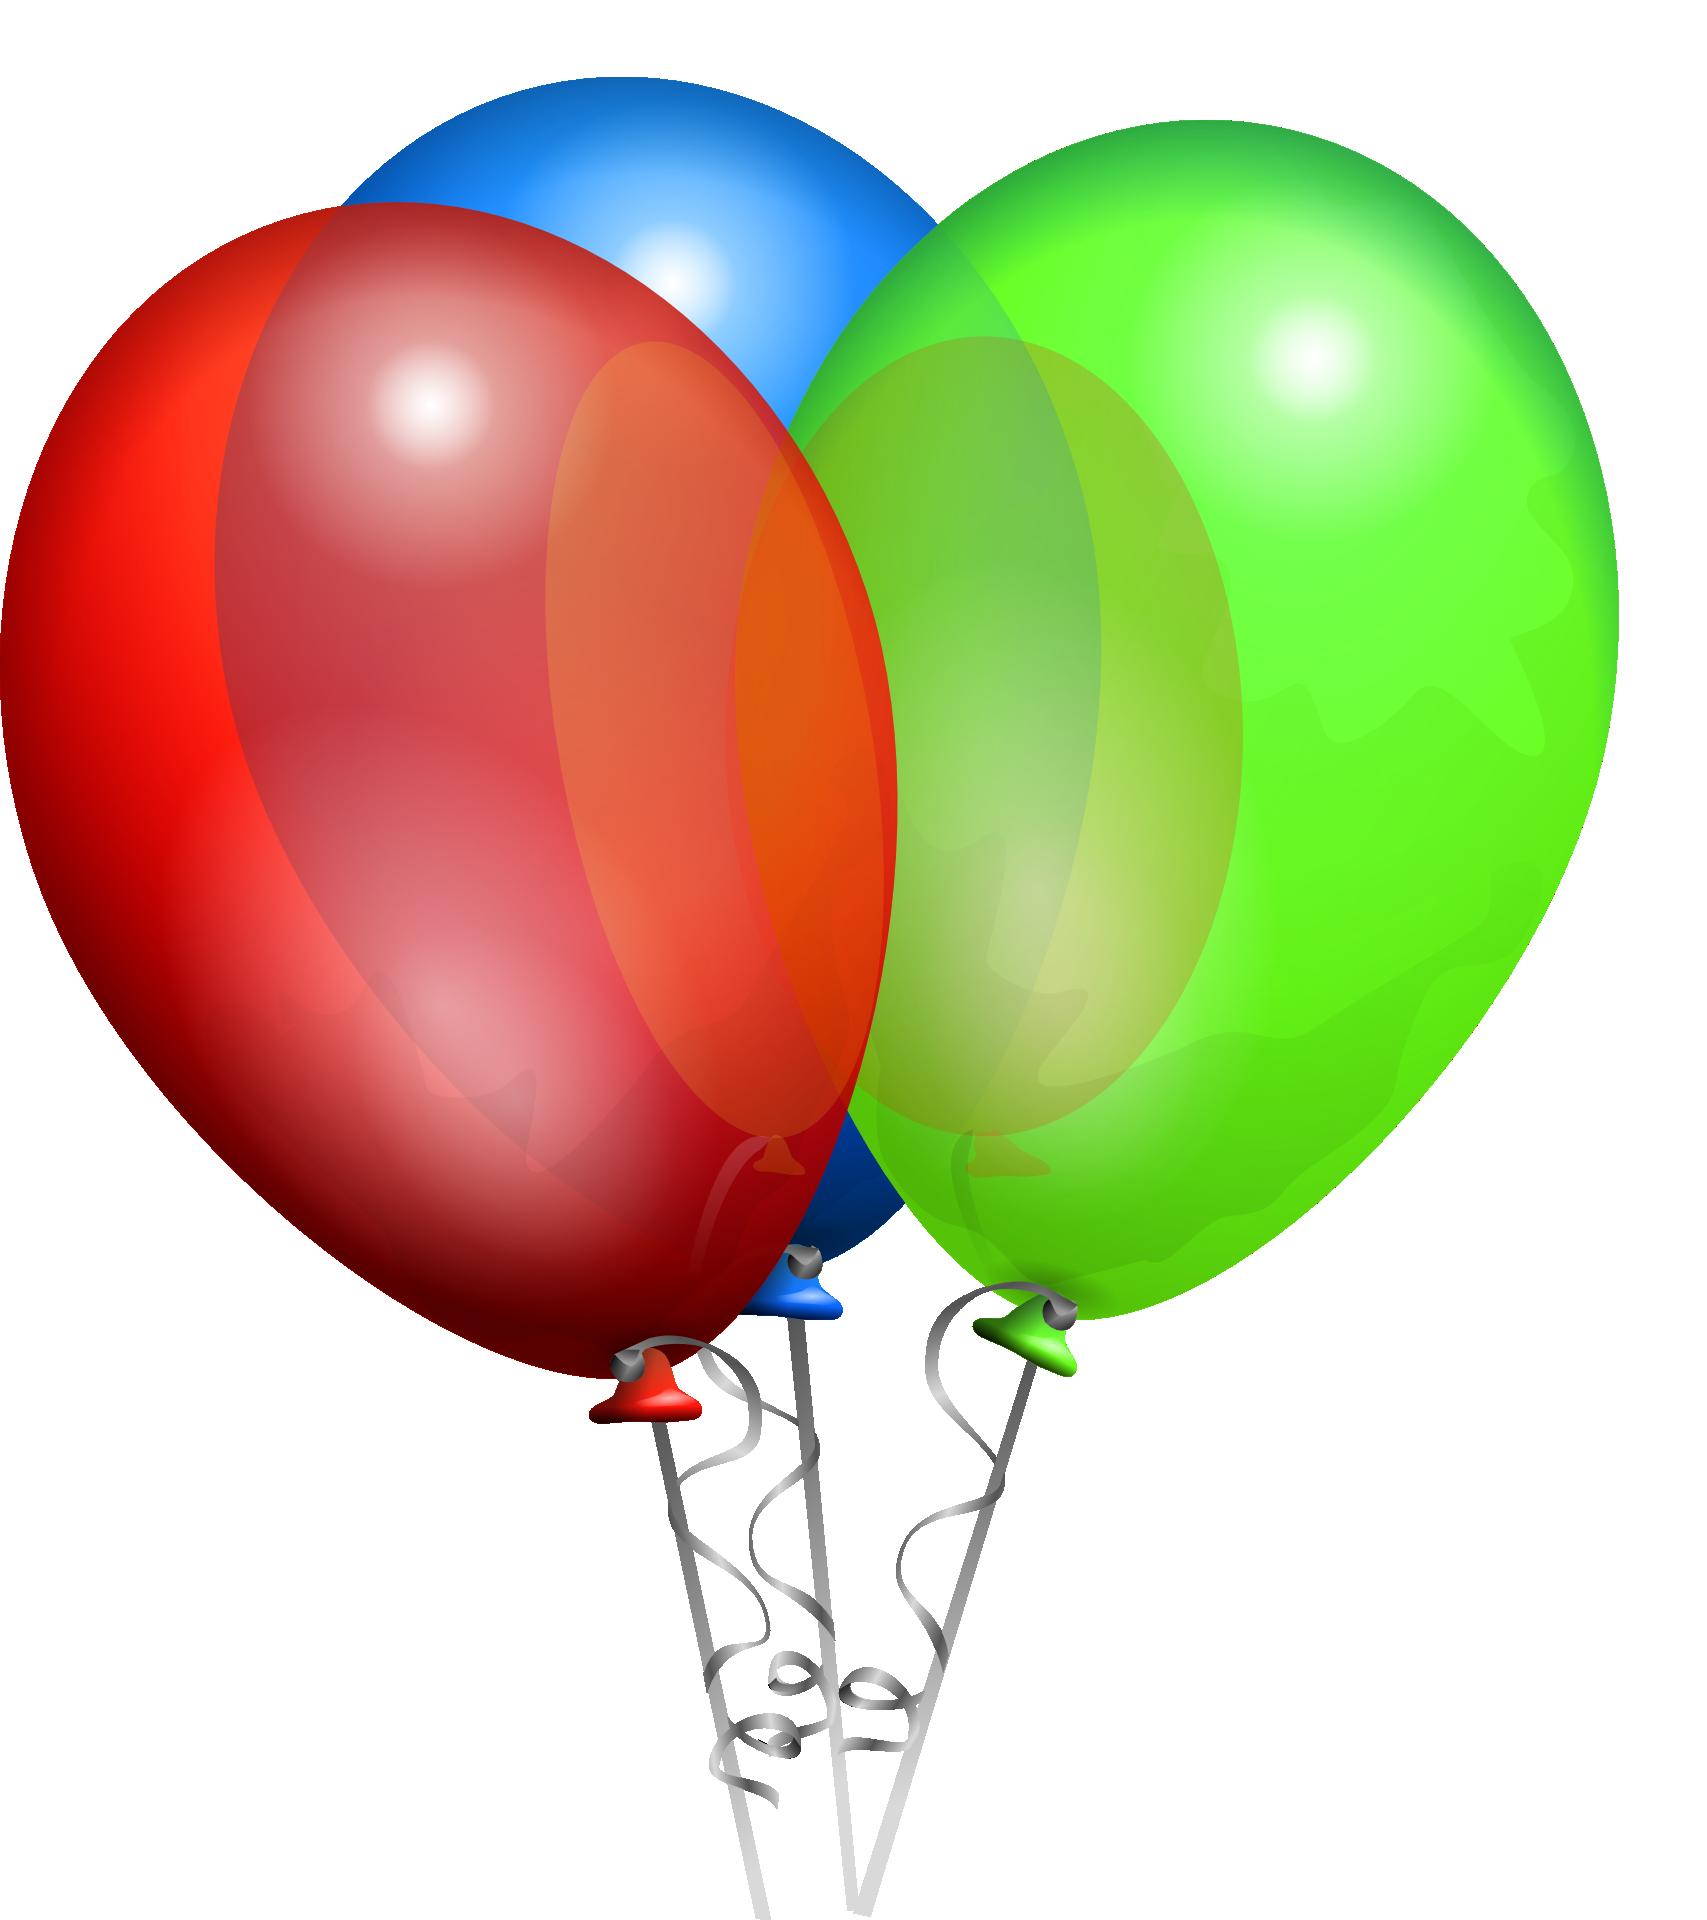 11 Blue Cartoon Balloon Vector Images